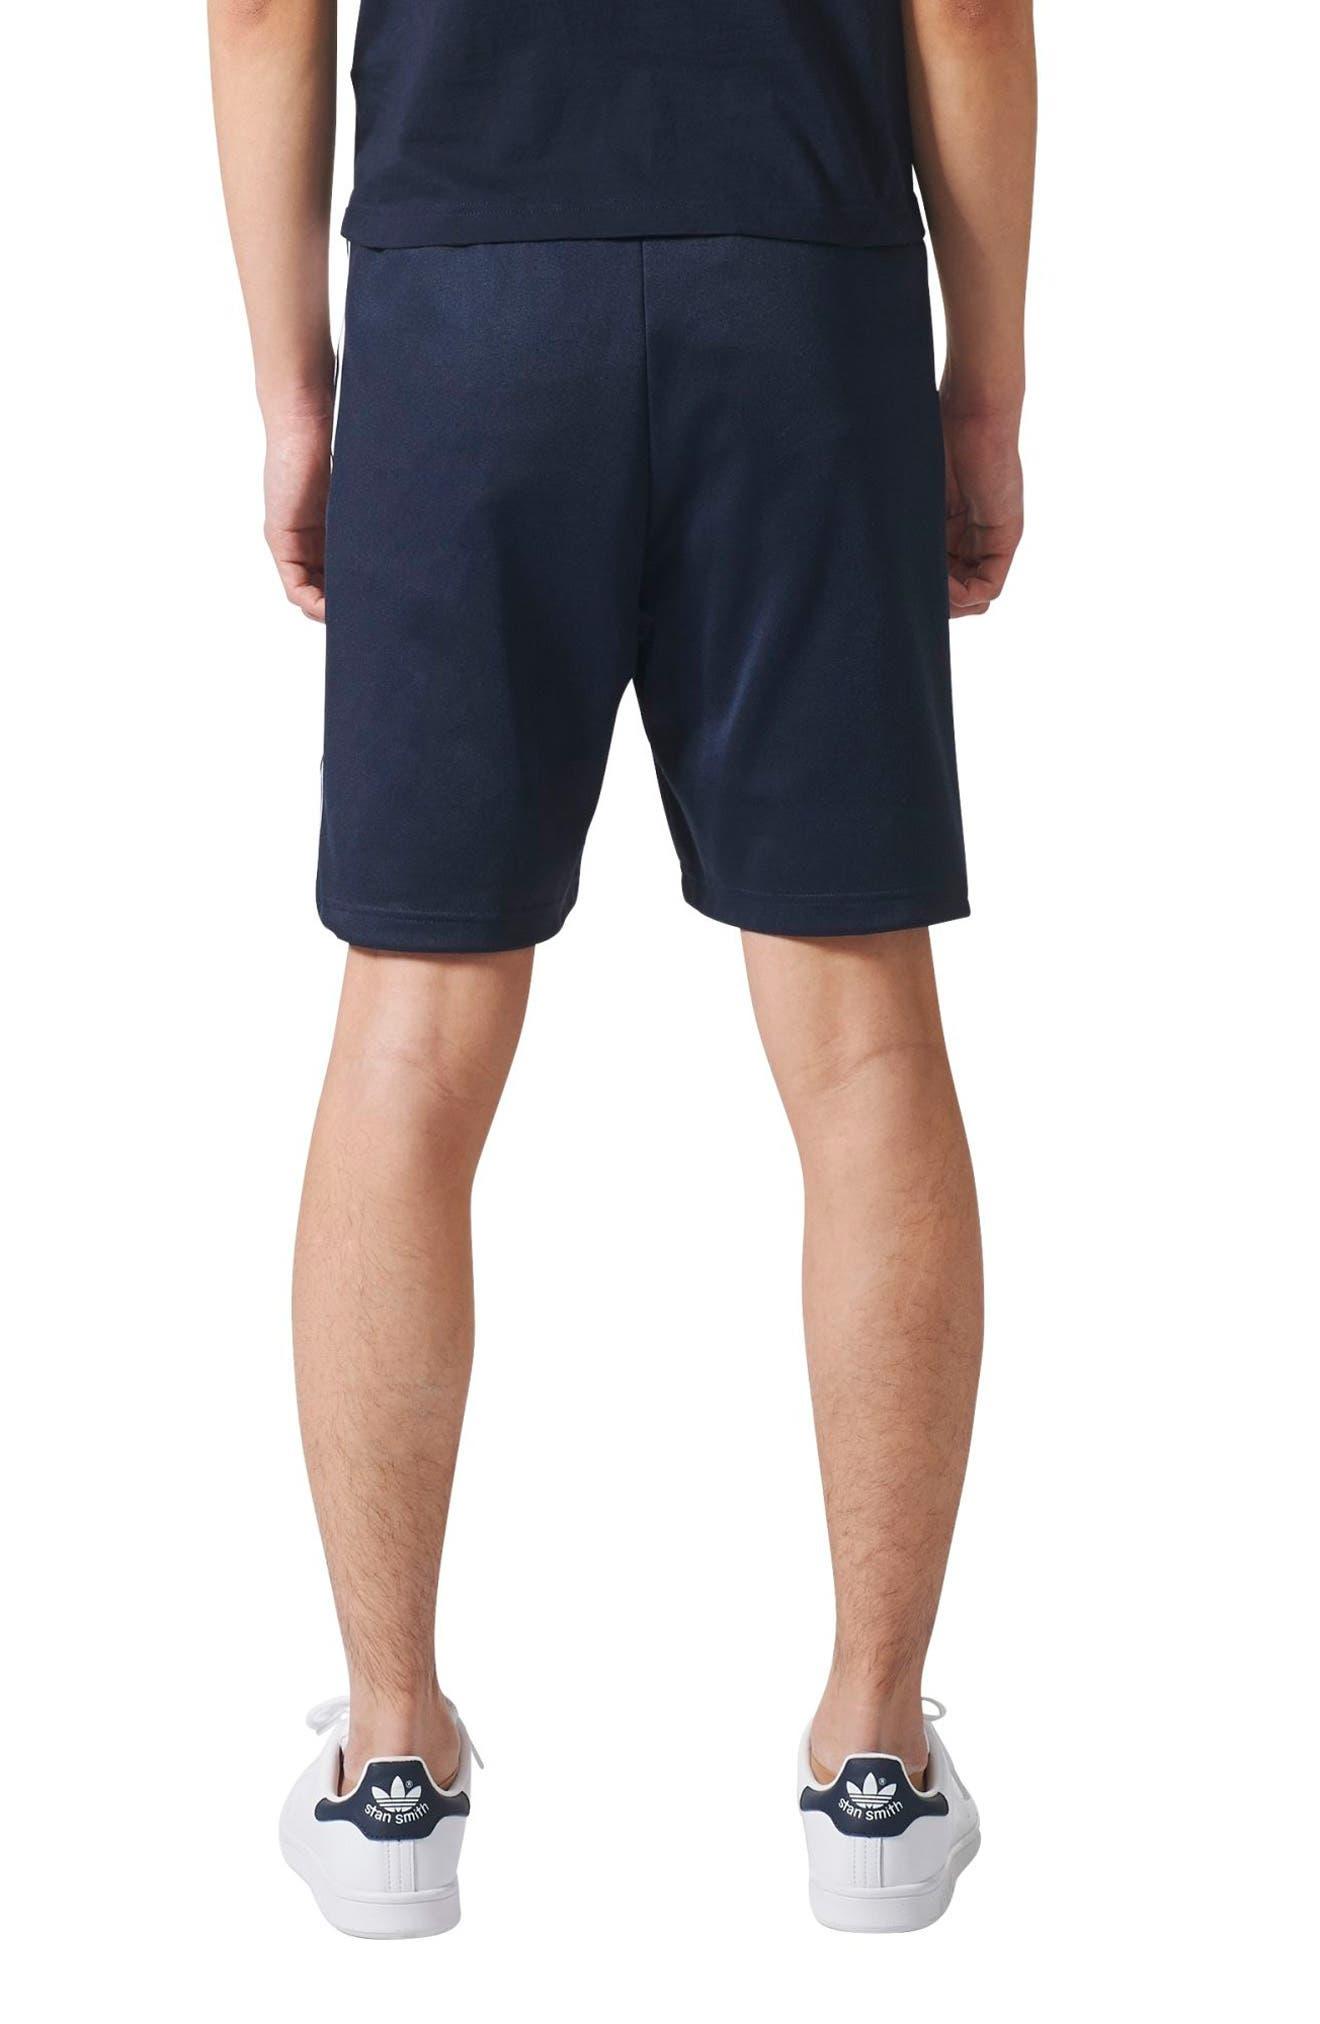 Beckenbauer Shorts,                             Alternate thumbnail 2, color,                             408